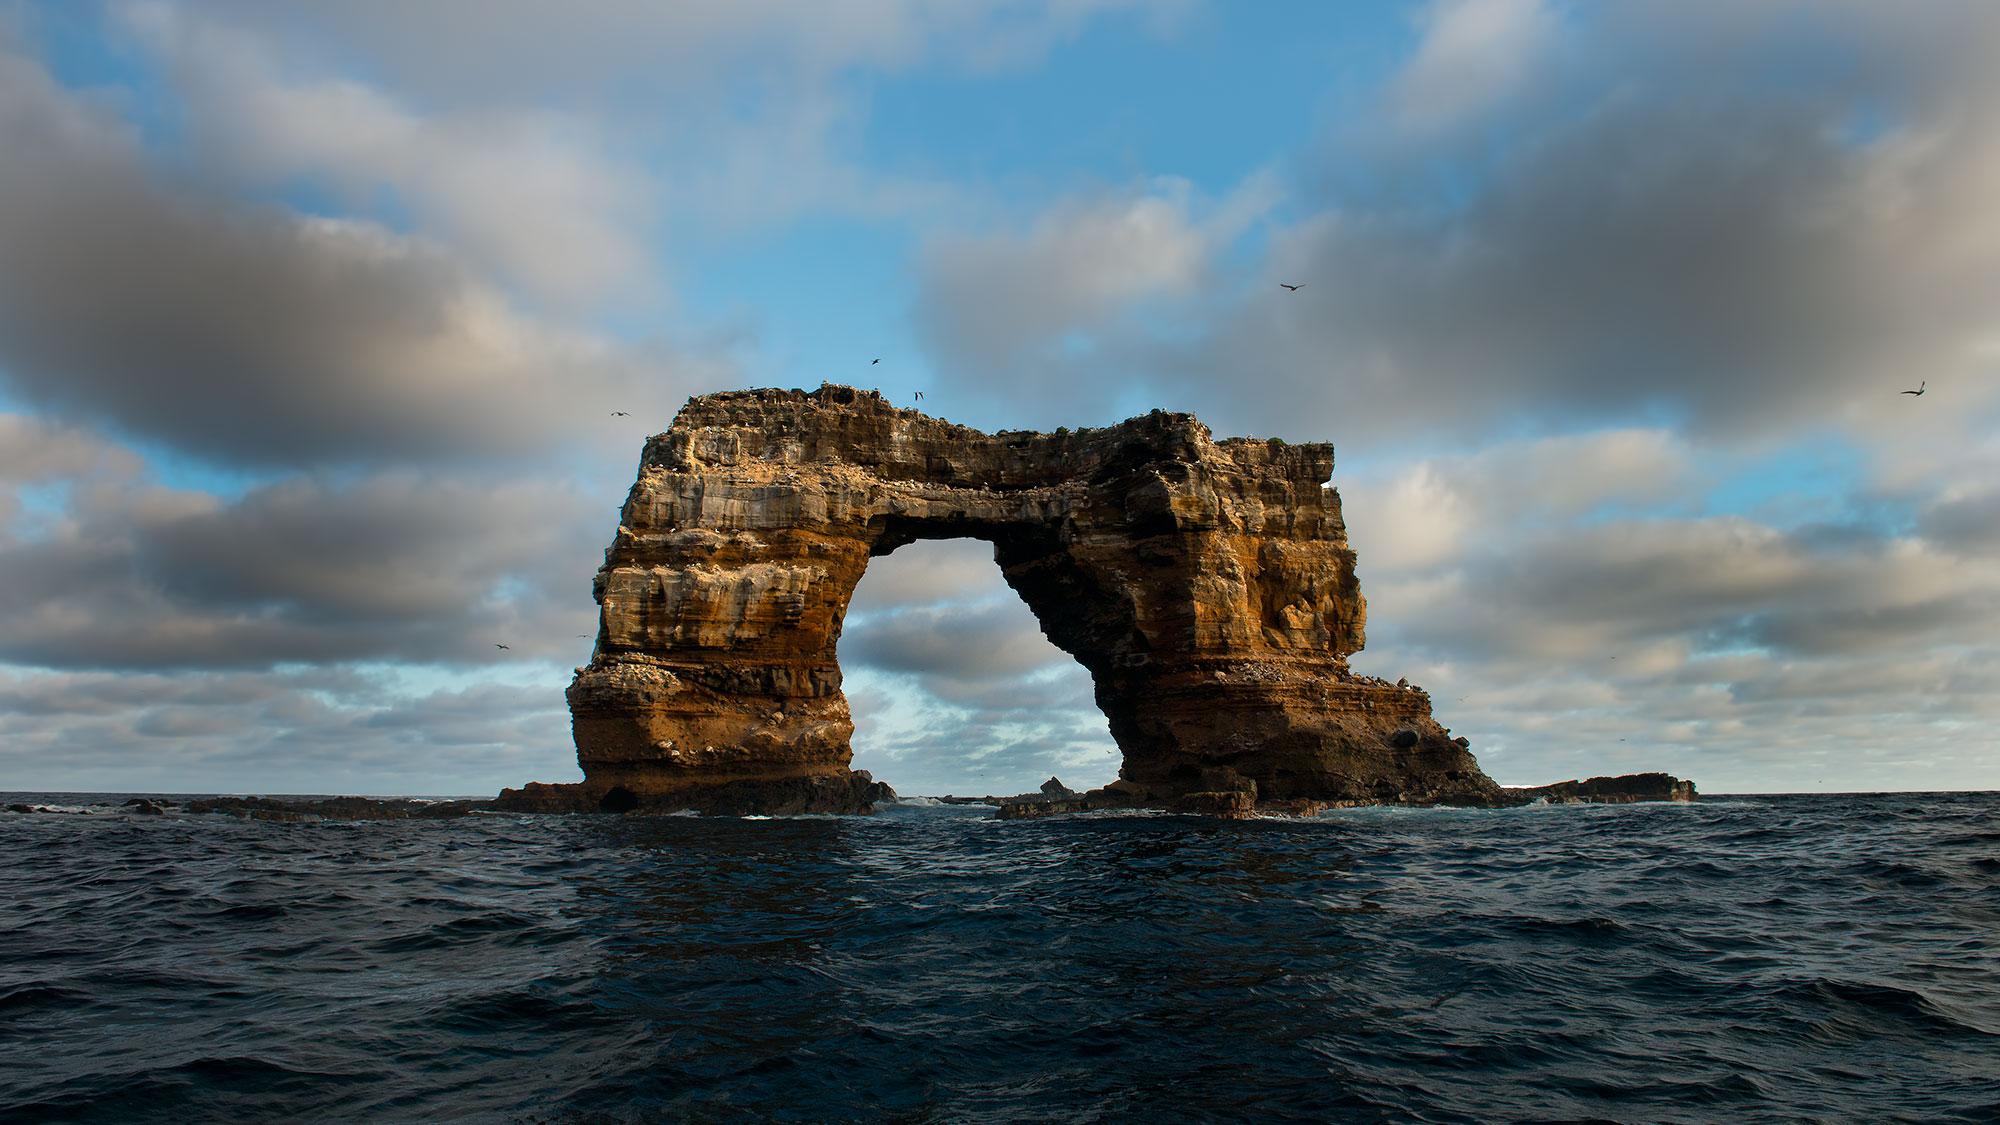 Galapagos Islands - Darwin Arch, Darwin Island